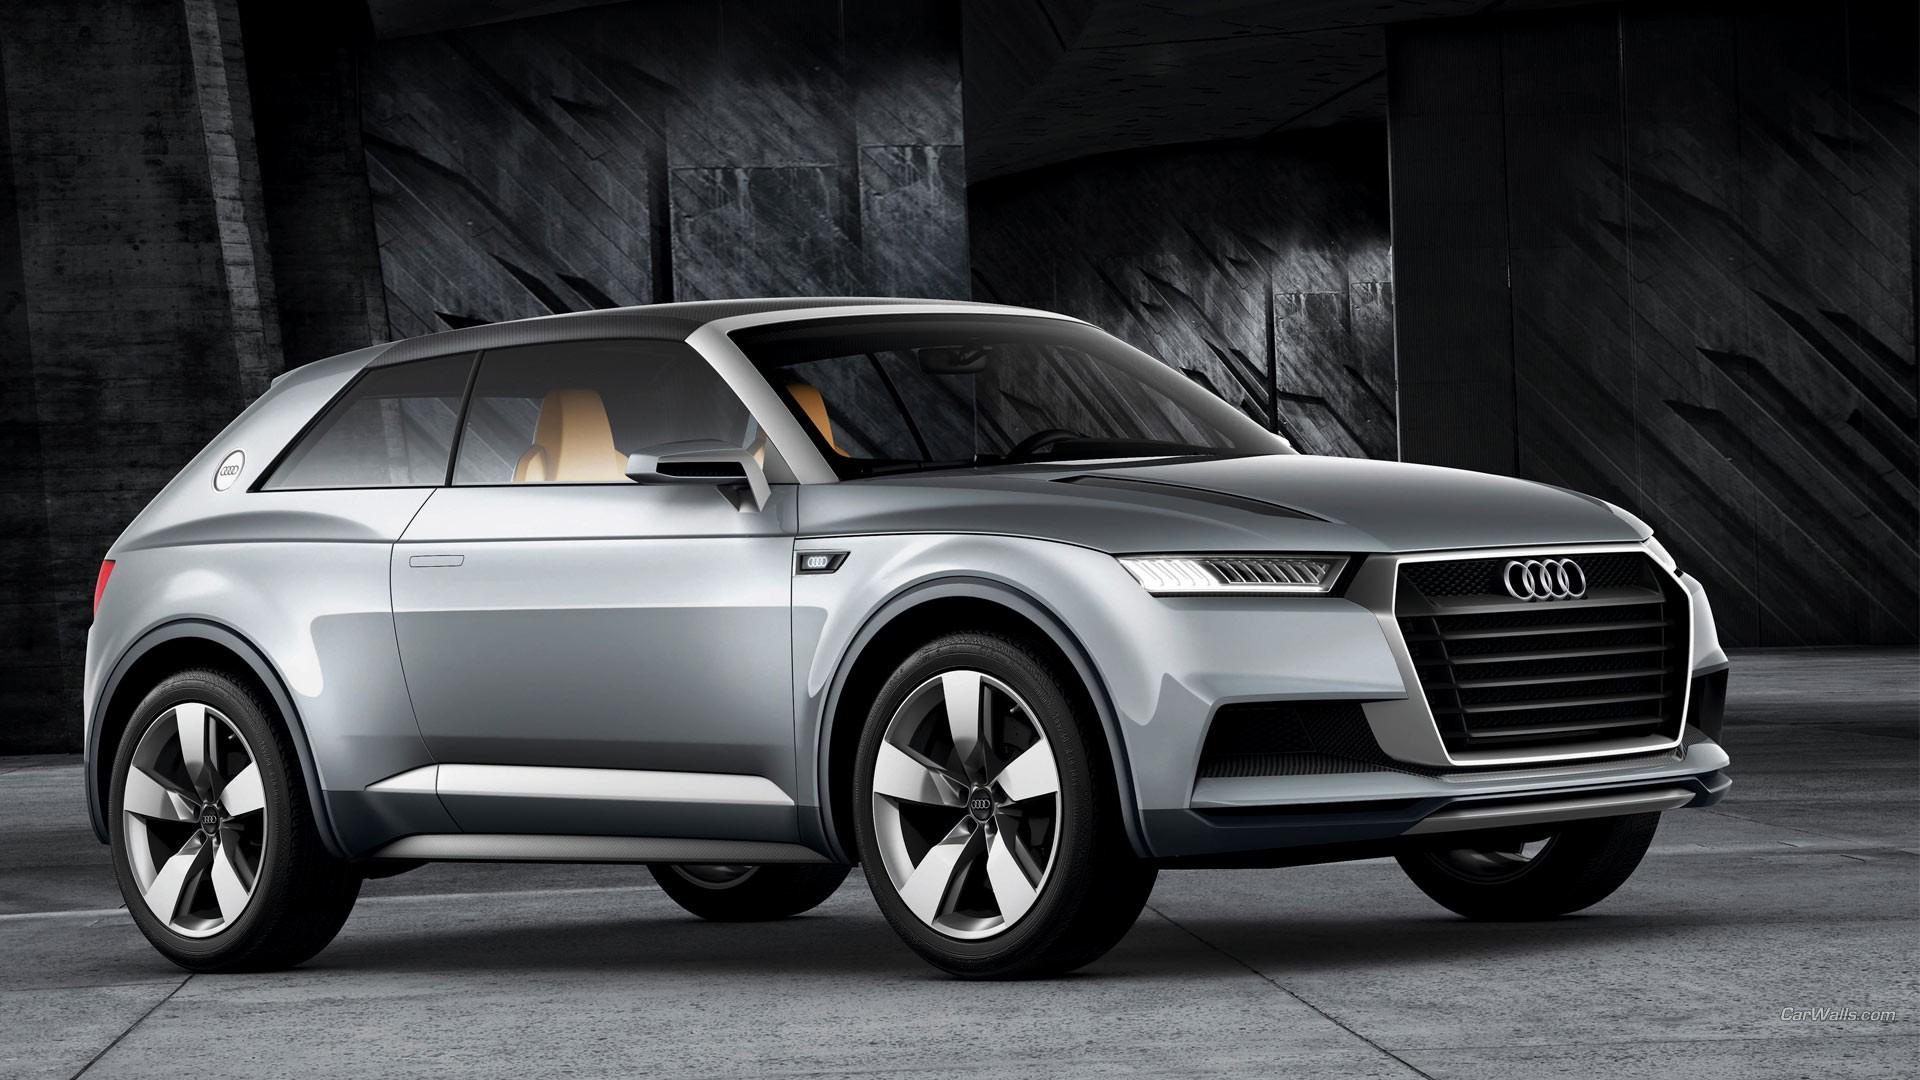 General 1920x1080 Audi Crossline car Audi grey cars concept car concept cars